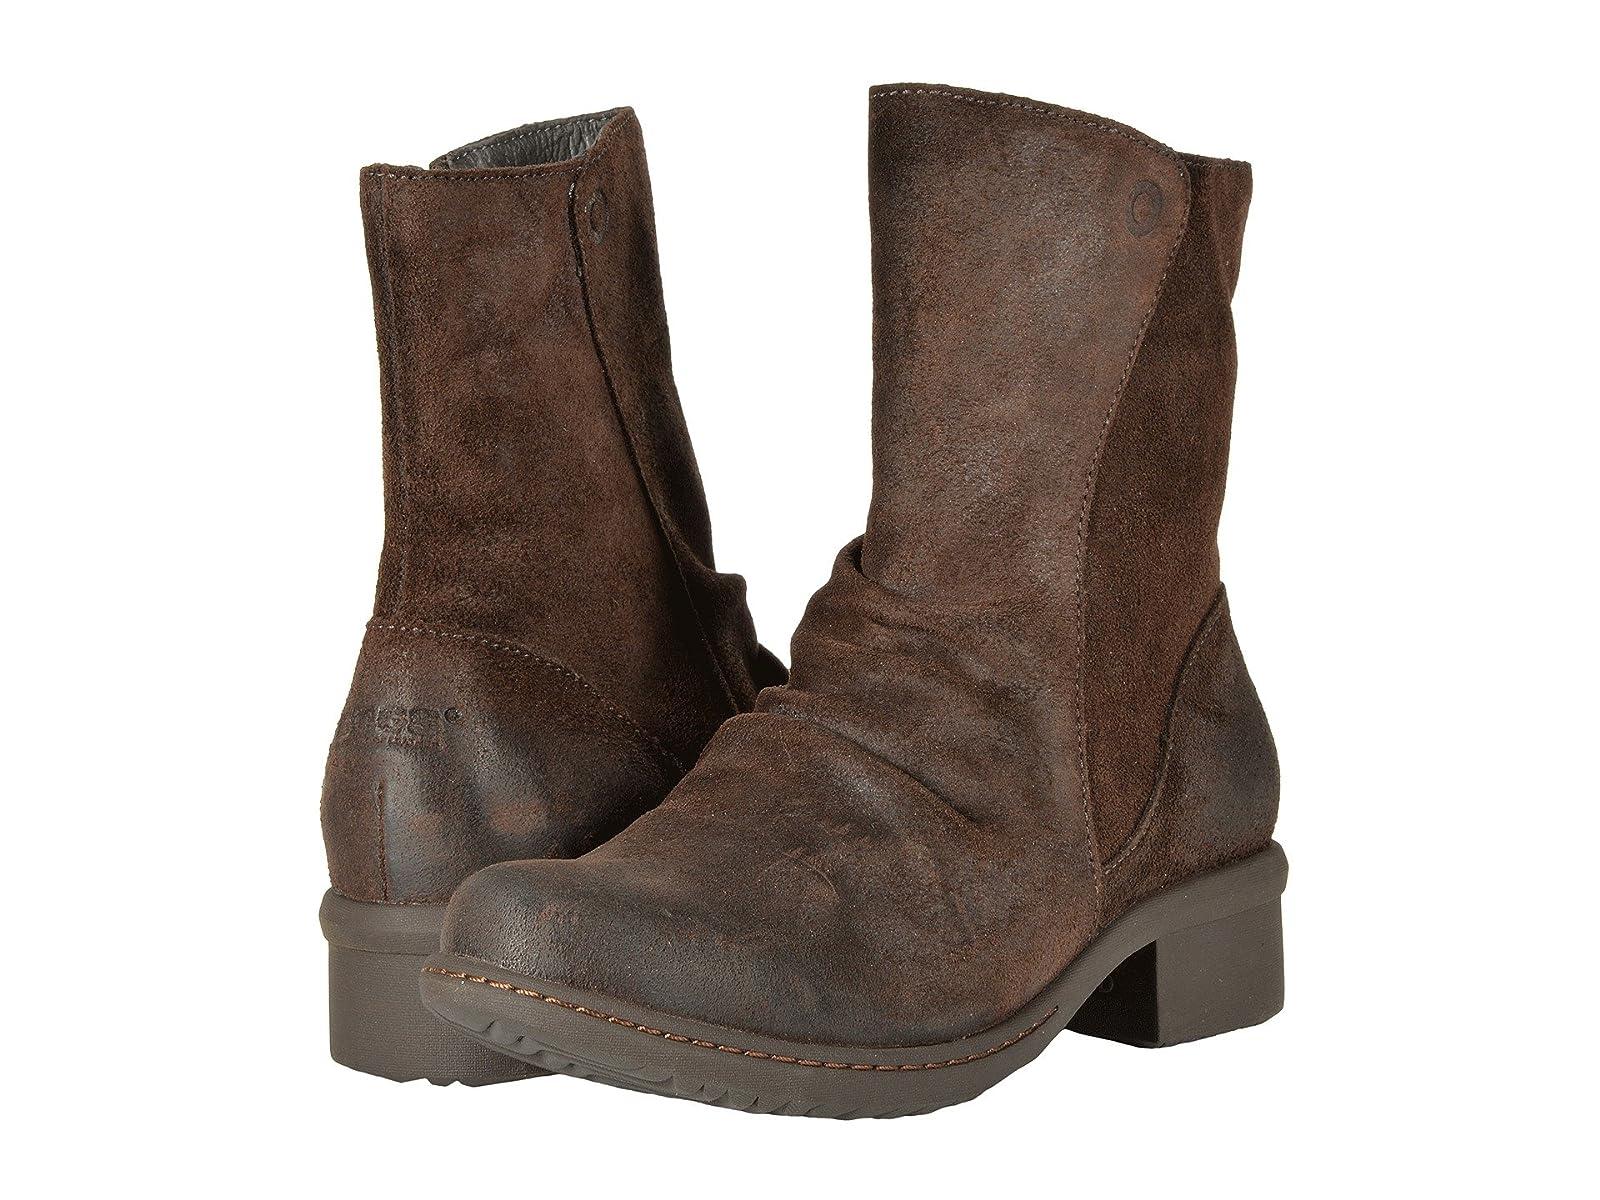 Bogs Auburn LeatherCheap and distinctive eye-catching shoes